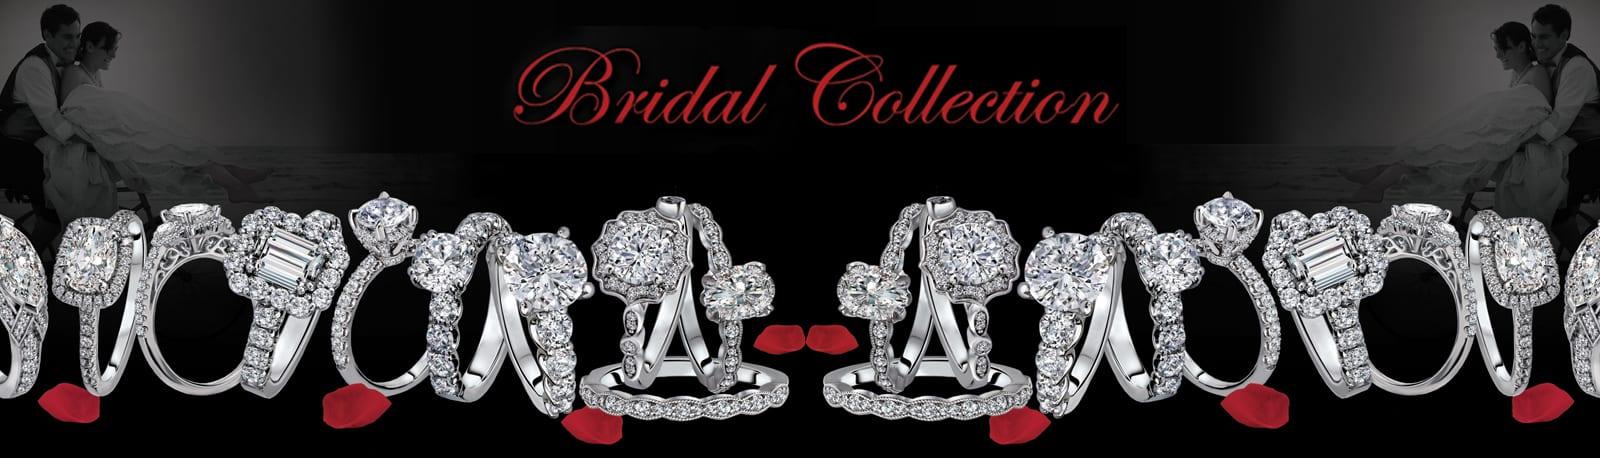 Guaranteed Best Prices on Loose Diamonds & Diamond Jewelry